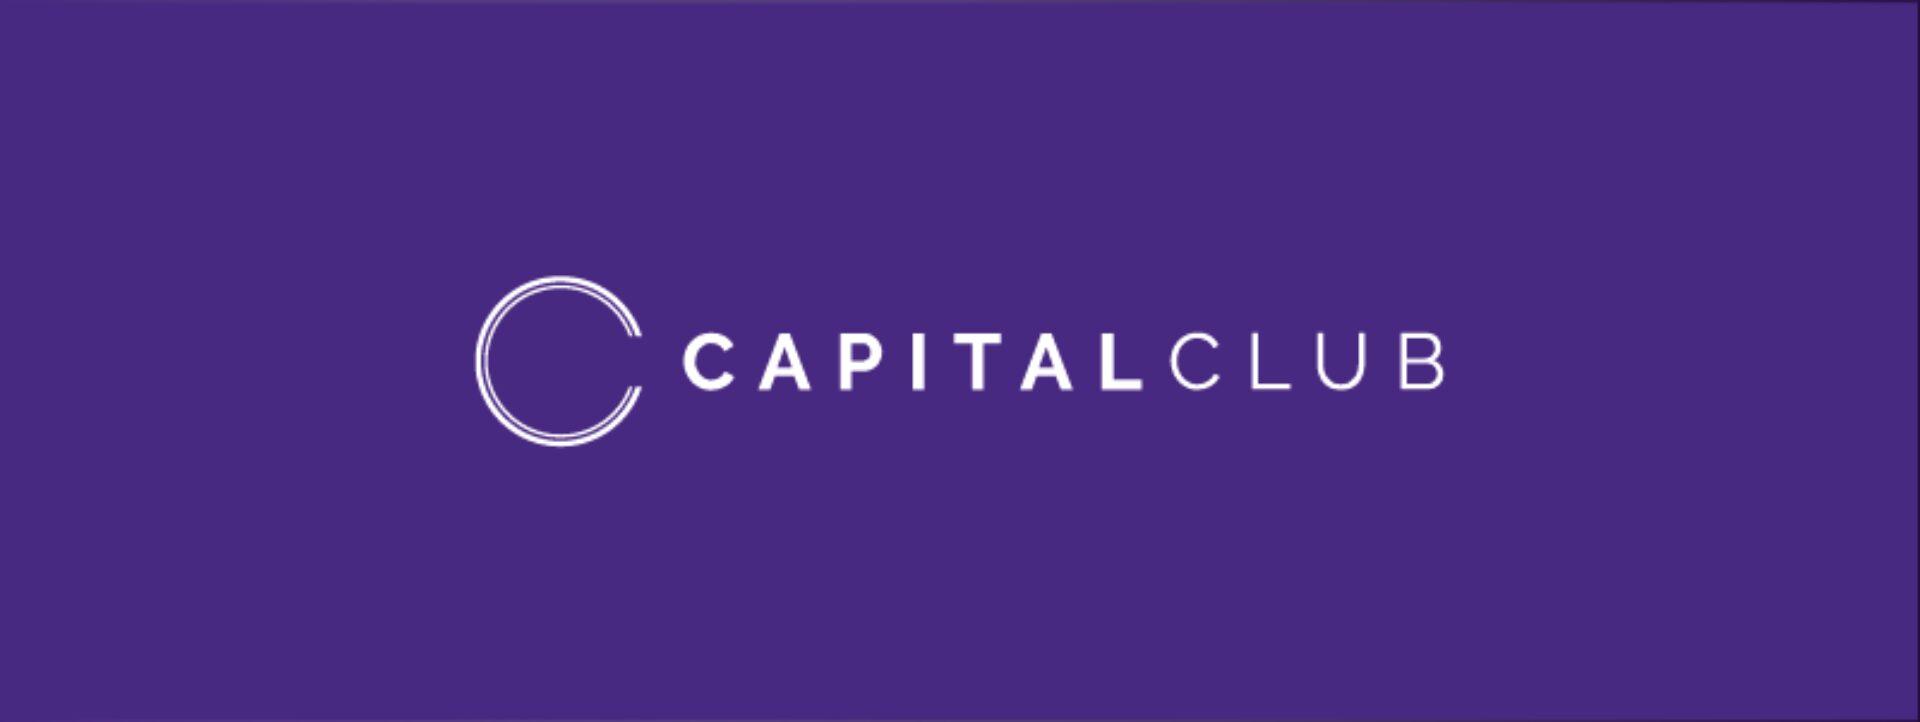 Capital Club web test 12